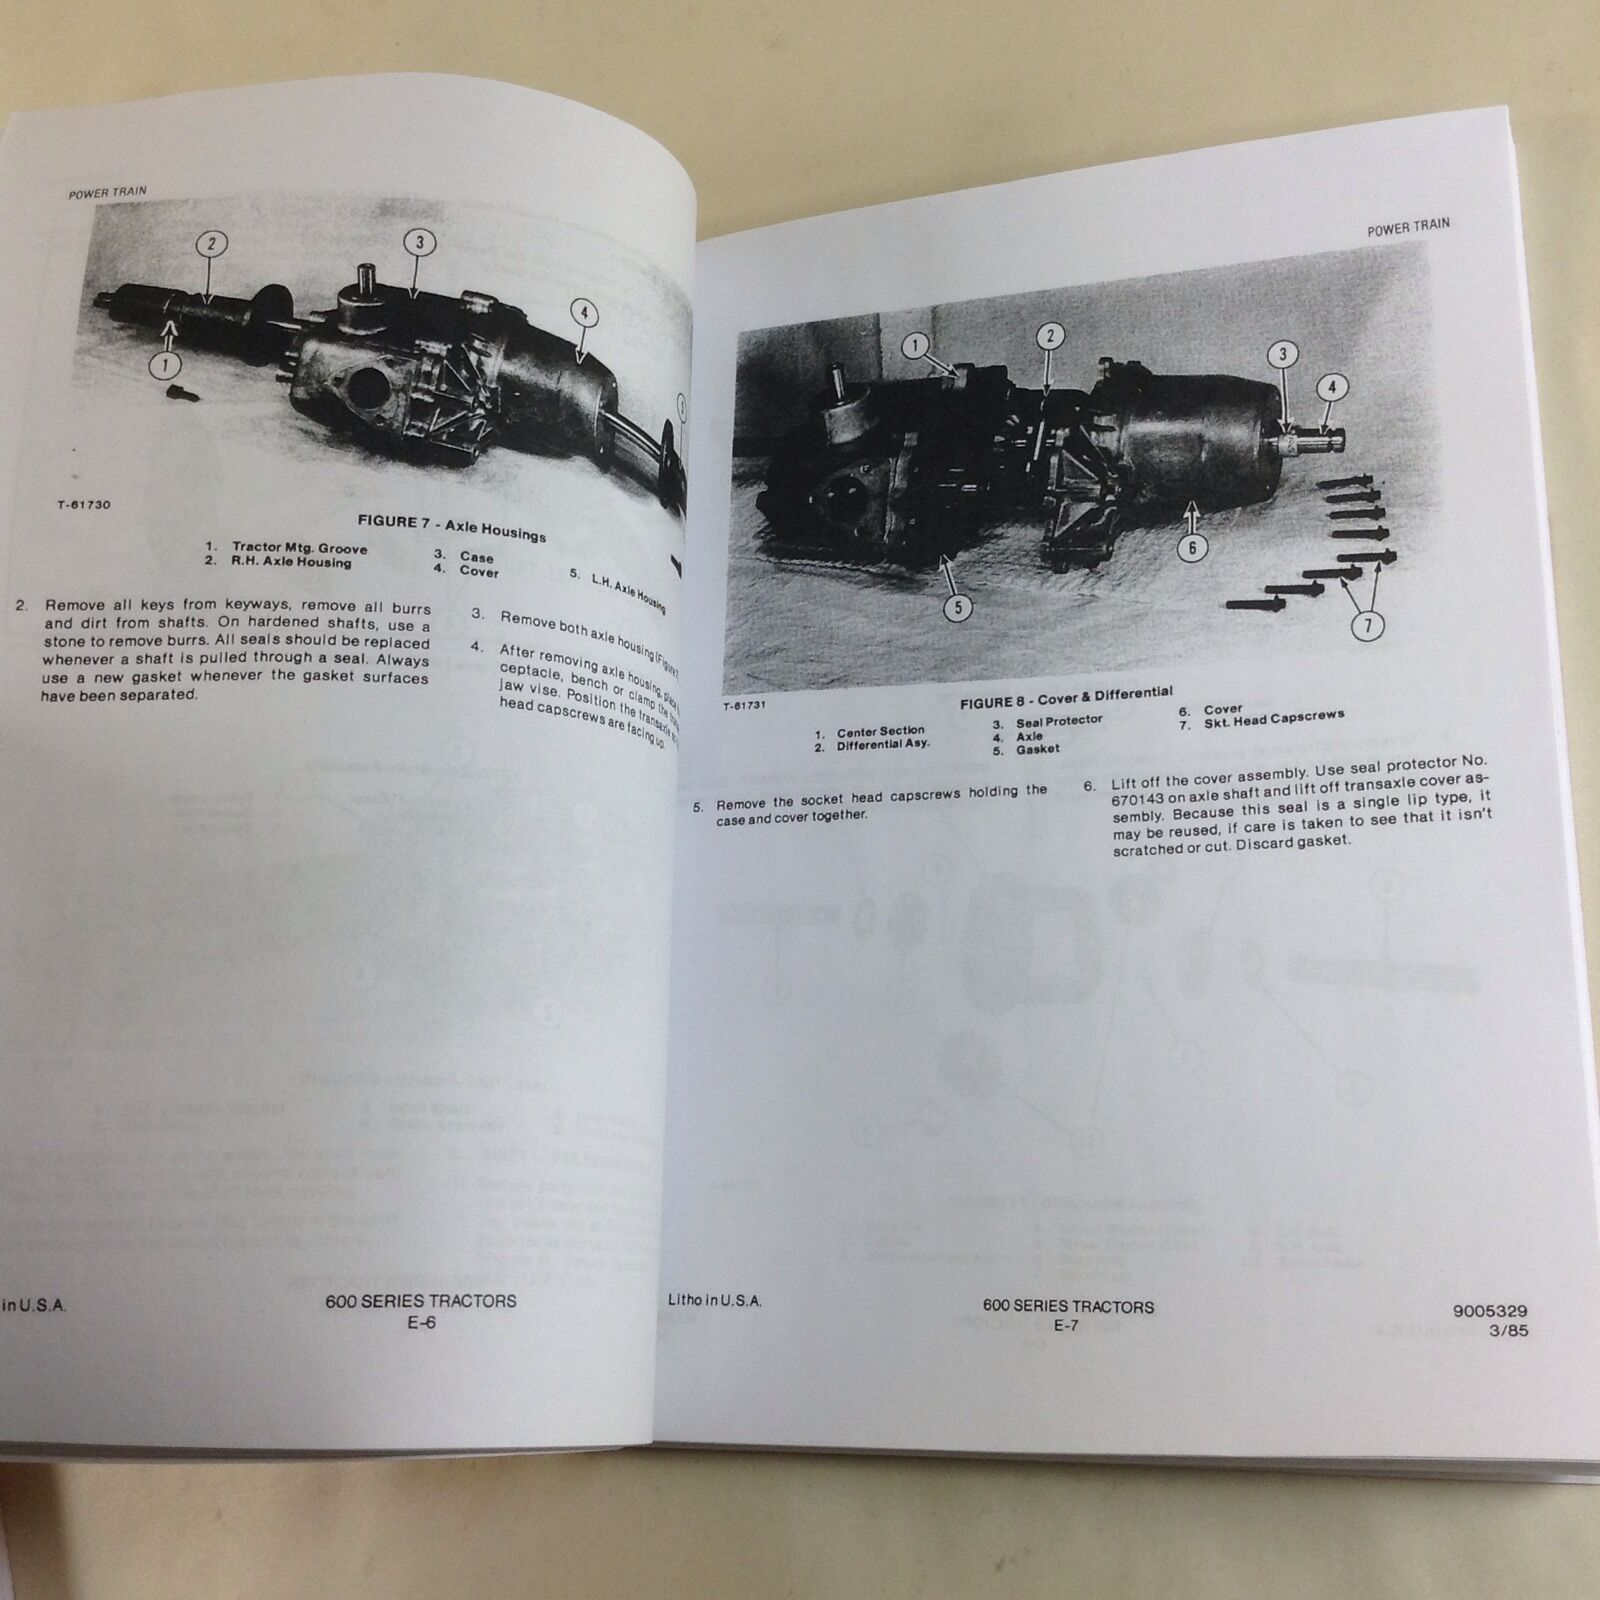 611 Allis Chalmers Wiring Schematic Library Garden Tractor Diagram Pics Lt Ltd Series Lawn Mower Service Repair Manual Ebay